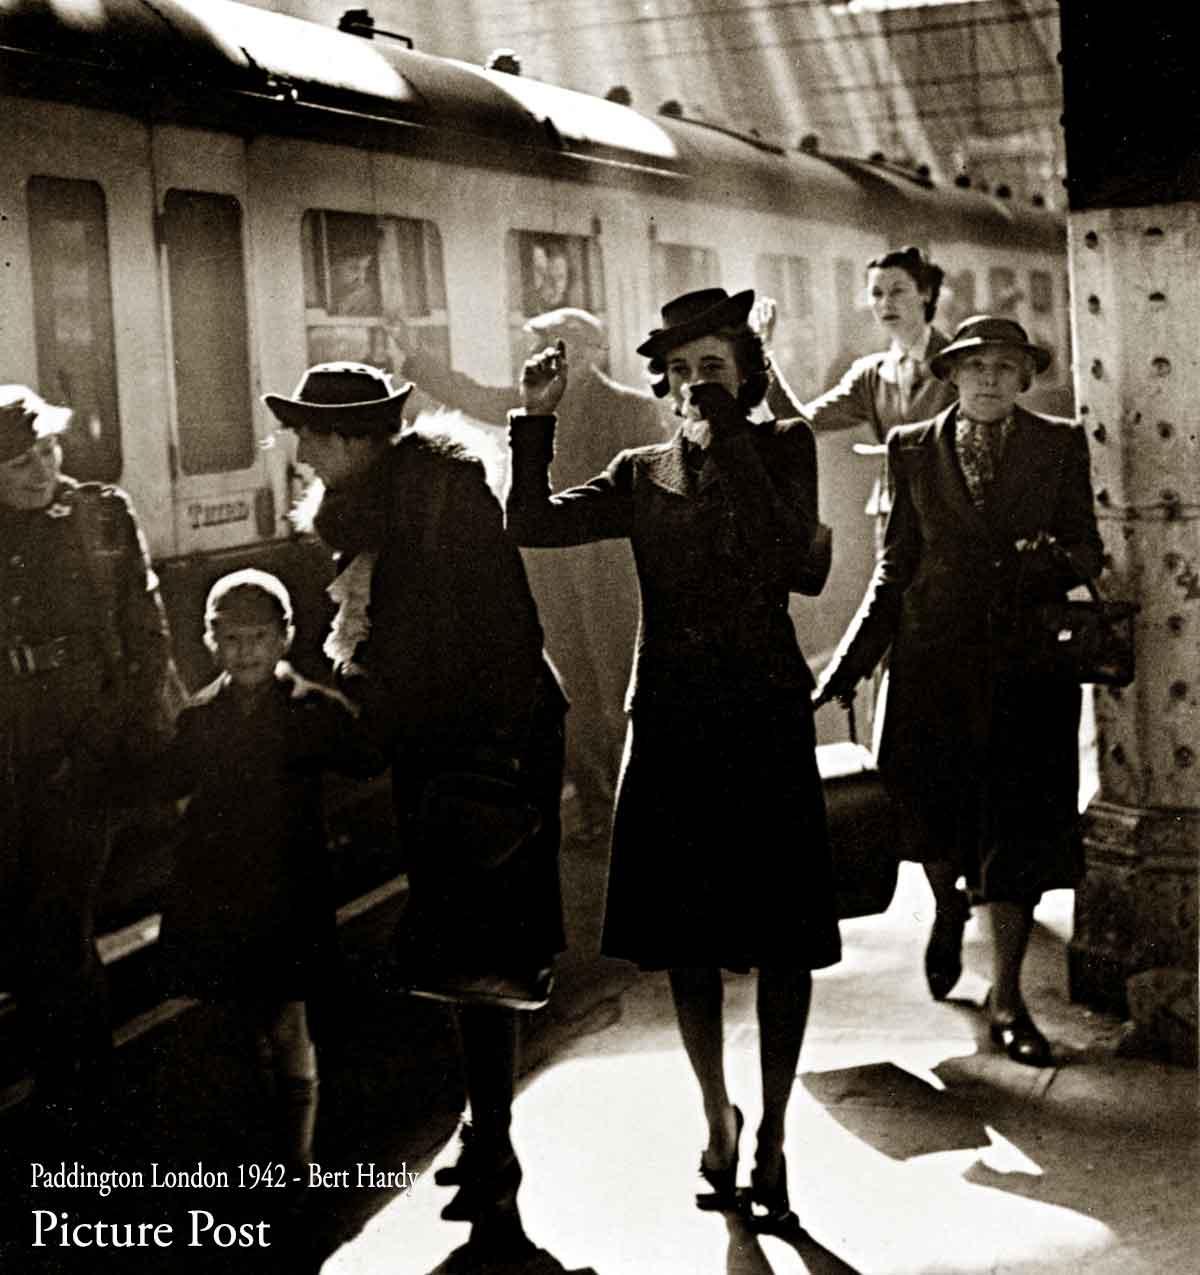 paddington-station-in-1942